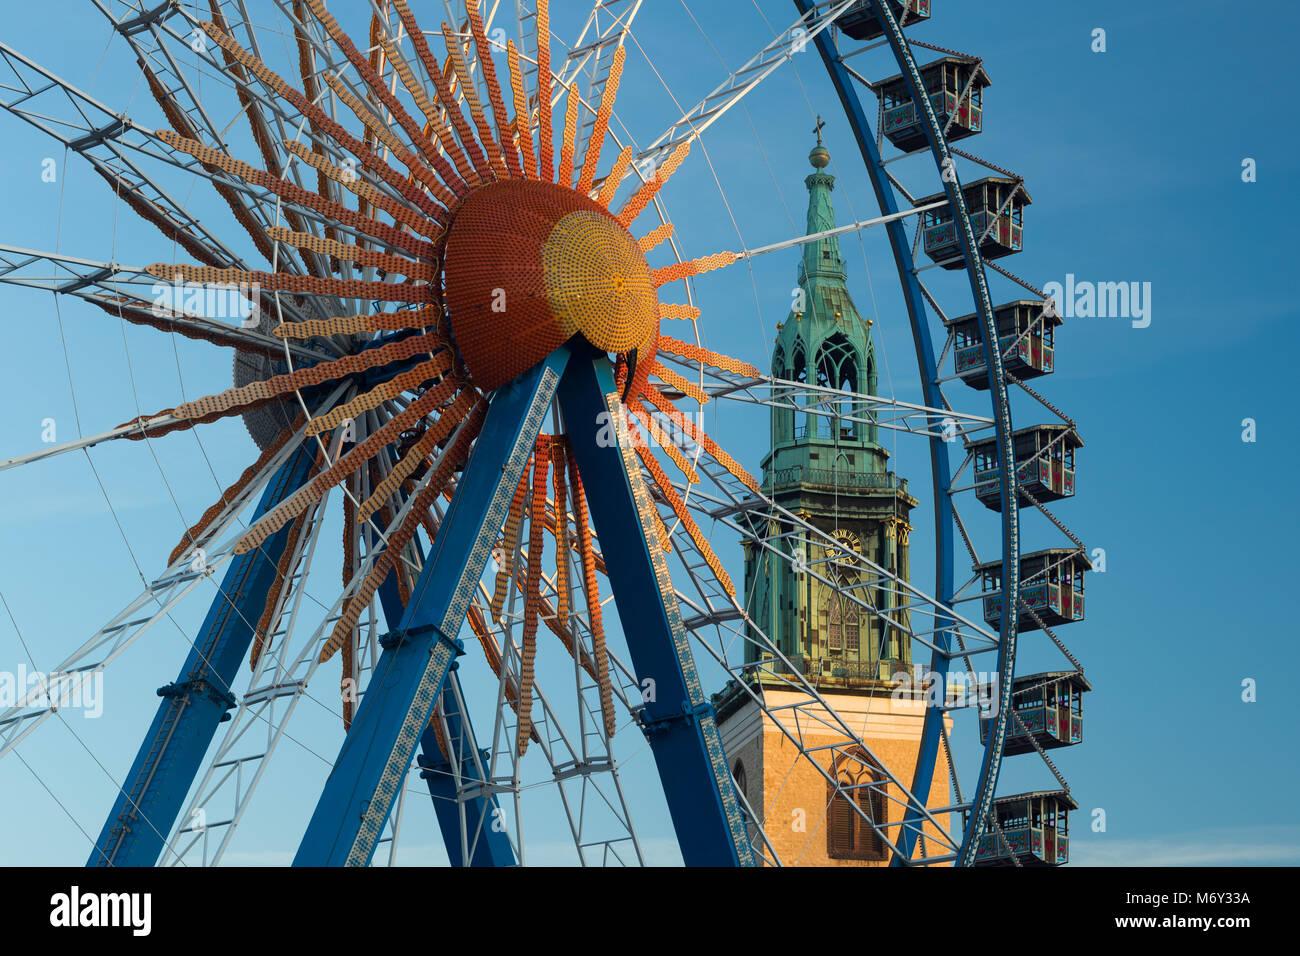 Una noria en Neptunbrunnen con Marienkirche detrás, Mitte, Berlin, Alemania Imagen De Stock